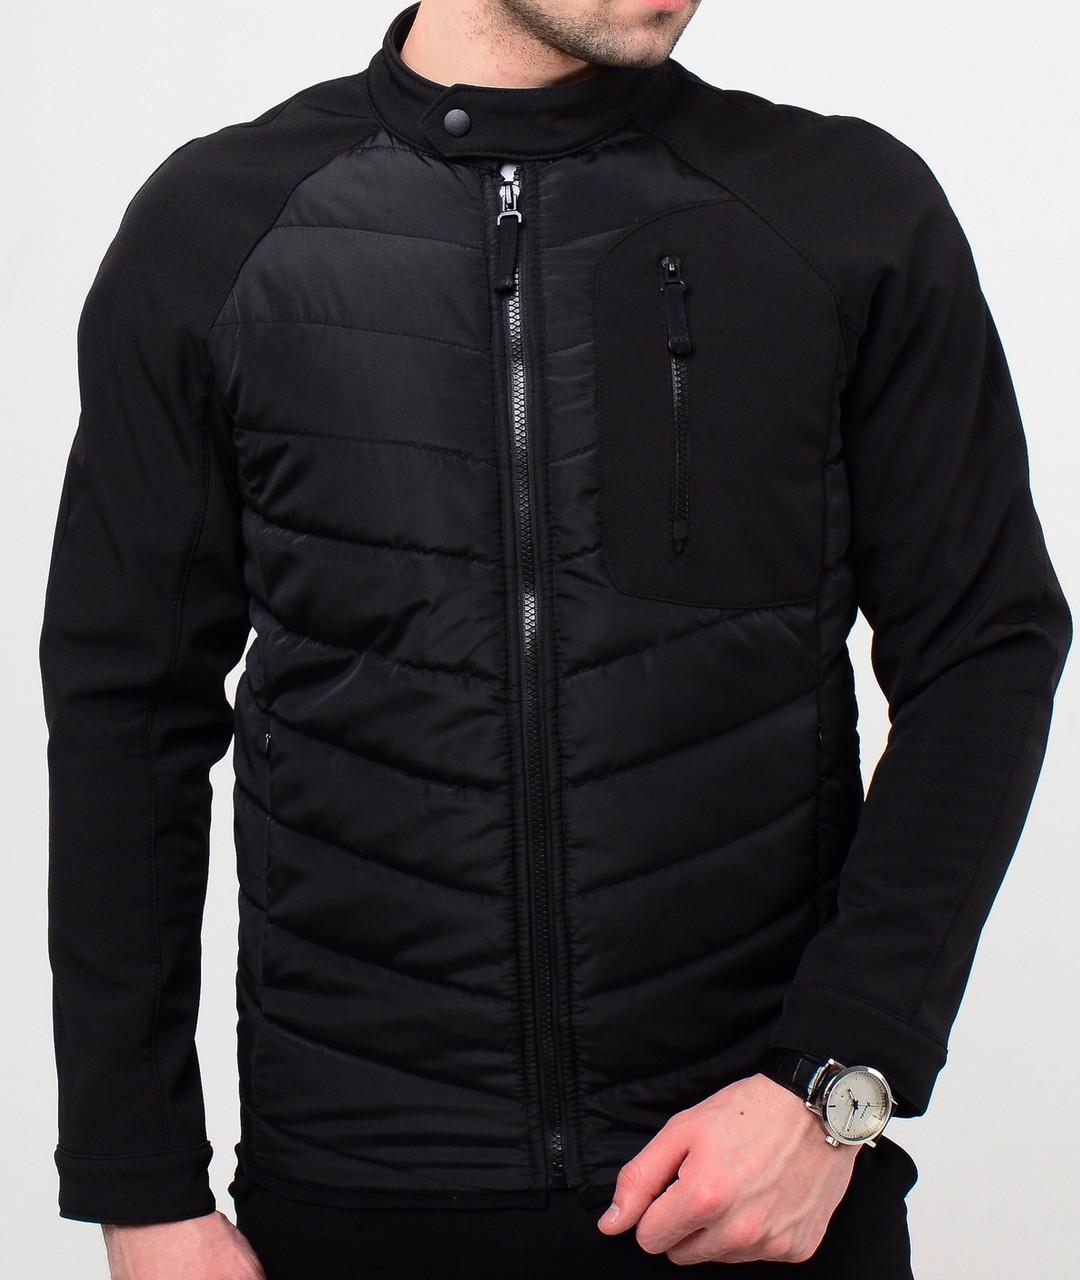 Куртка Юнайтед черная